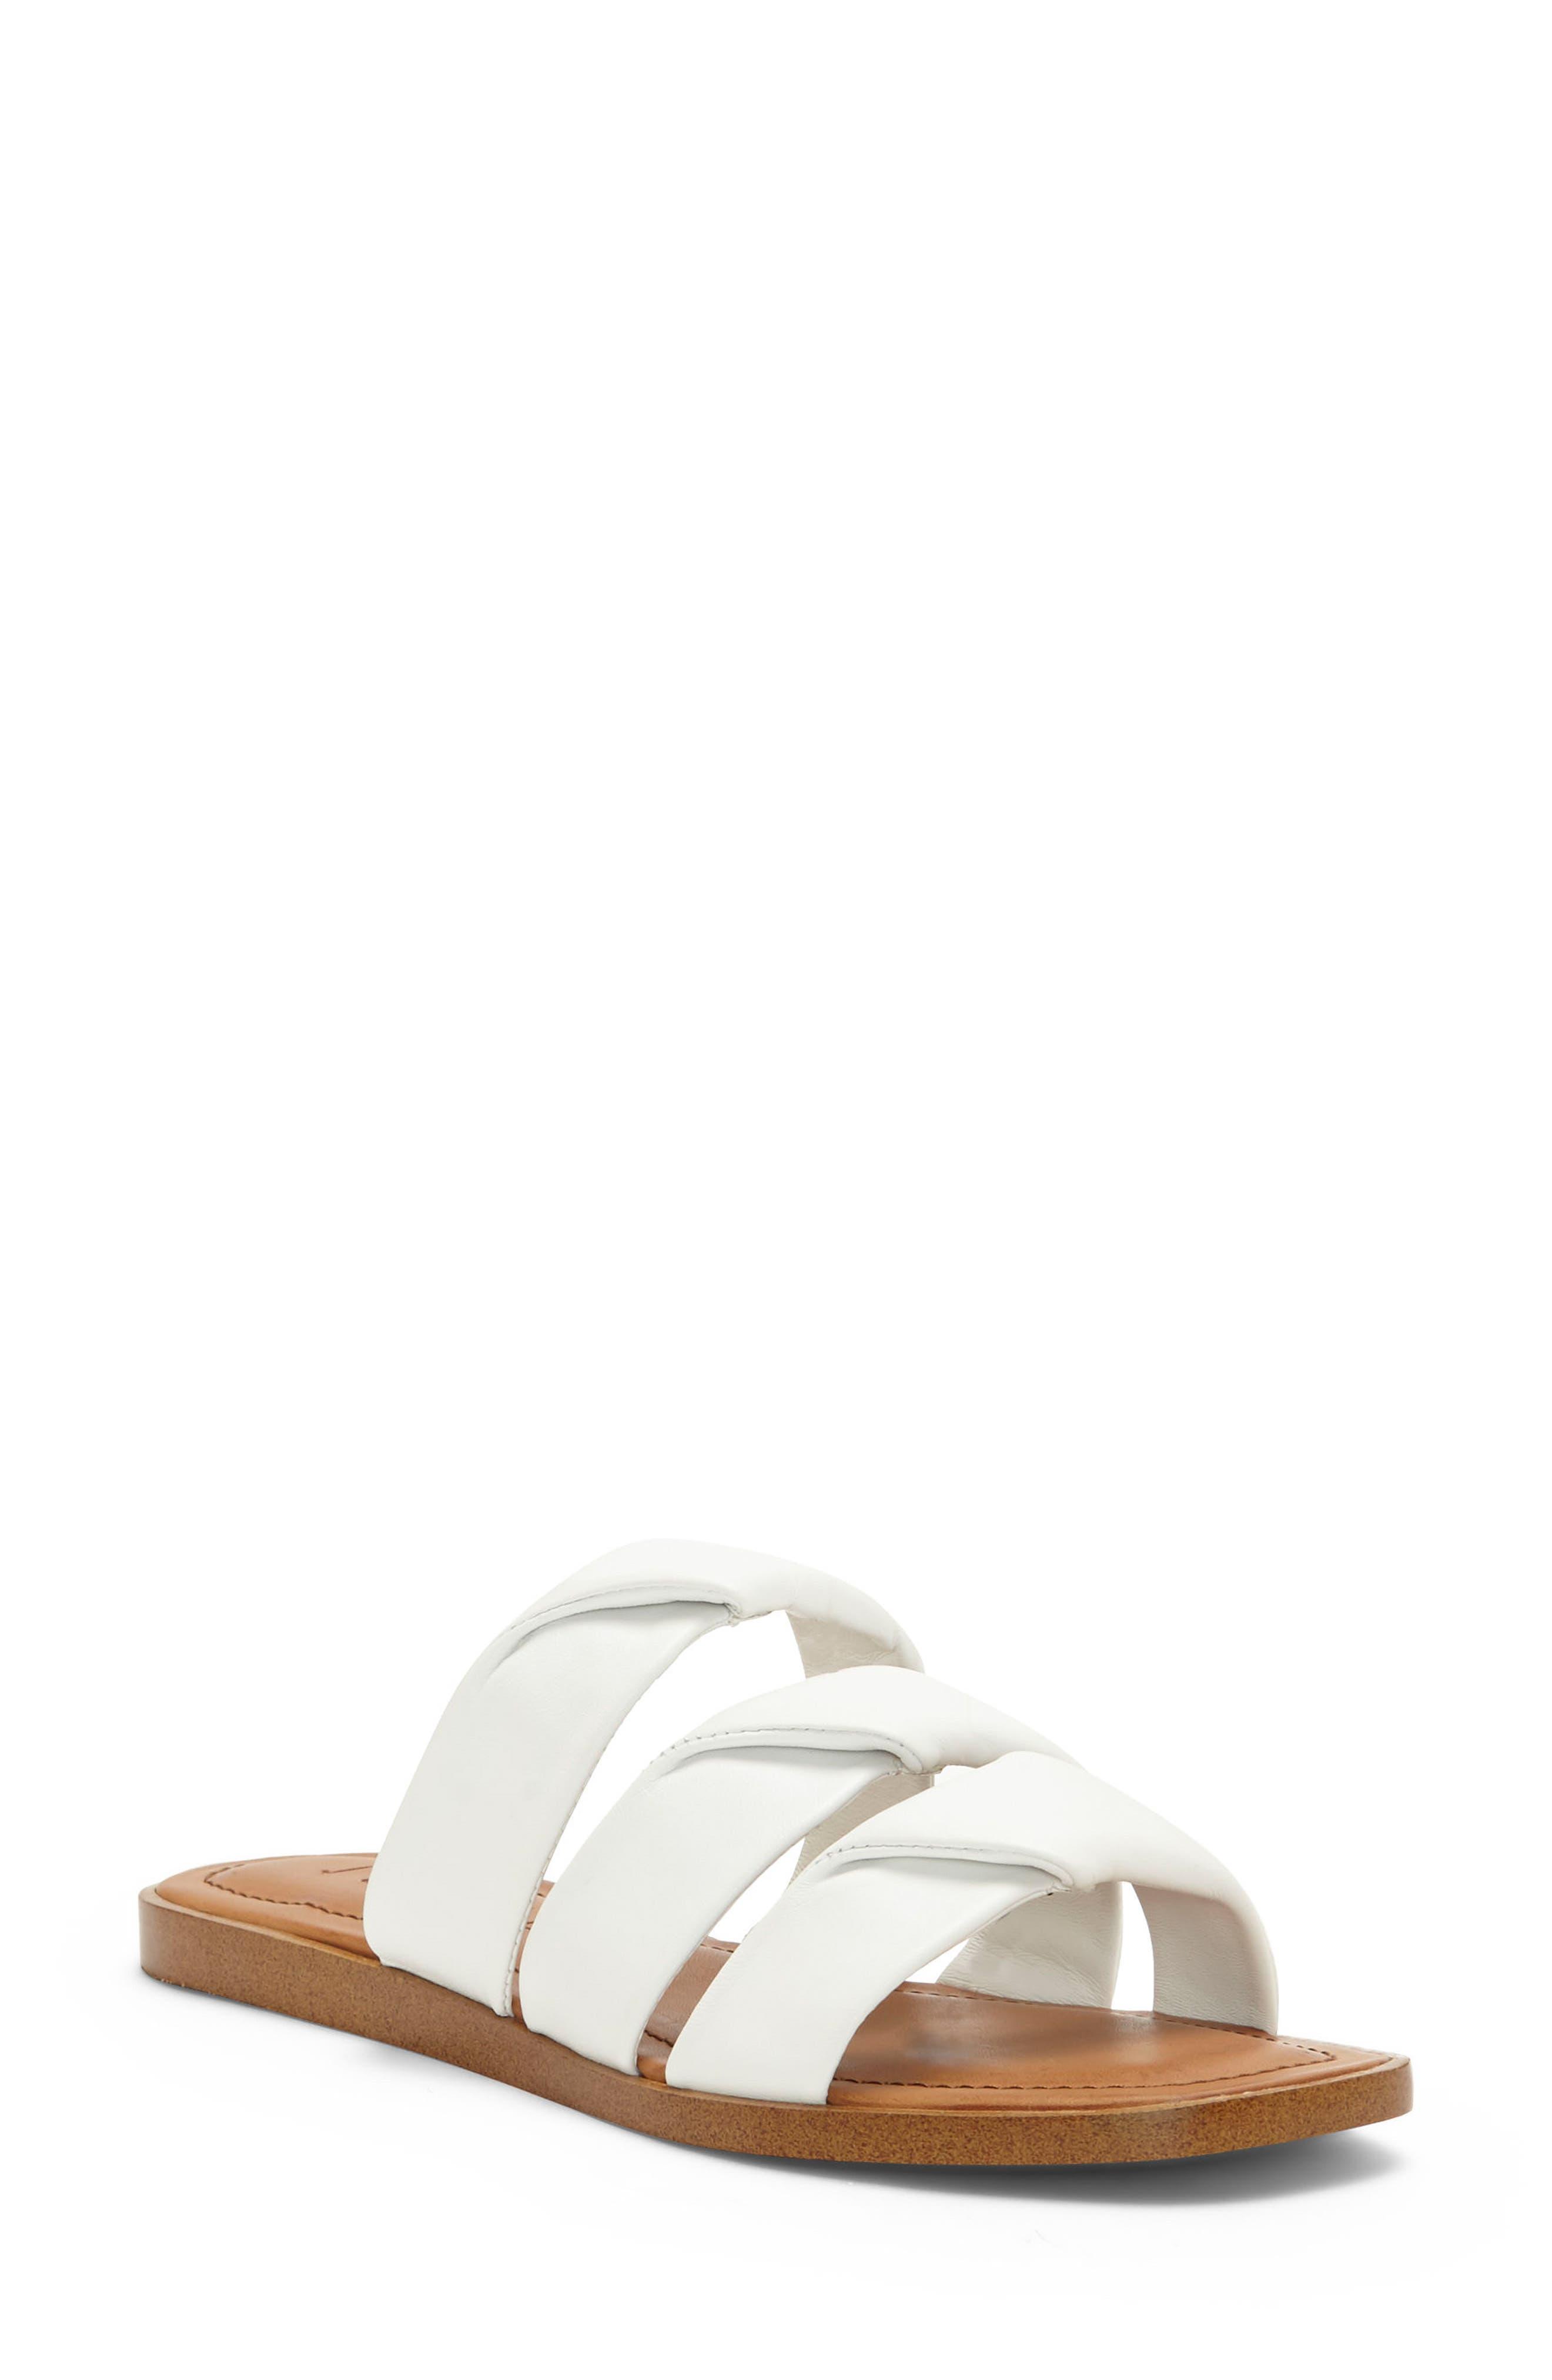 Frel Slide Sandal,                         Main,                         color, White Leather